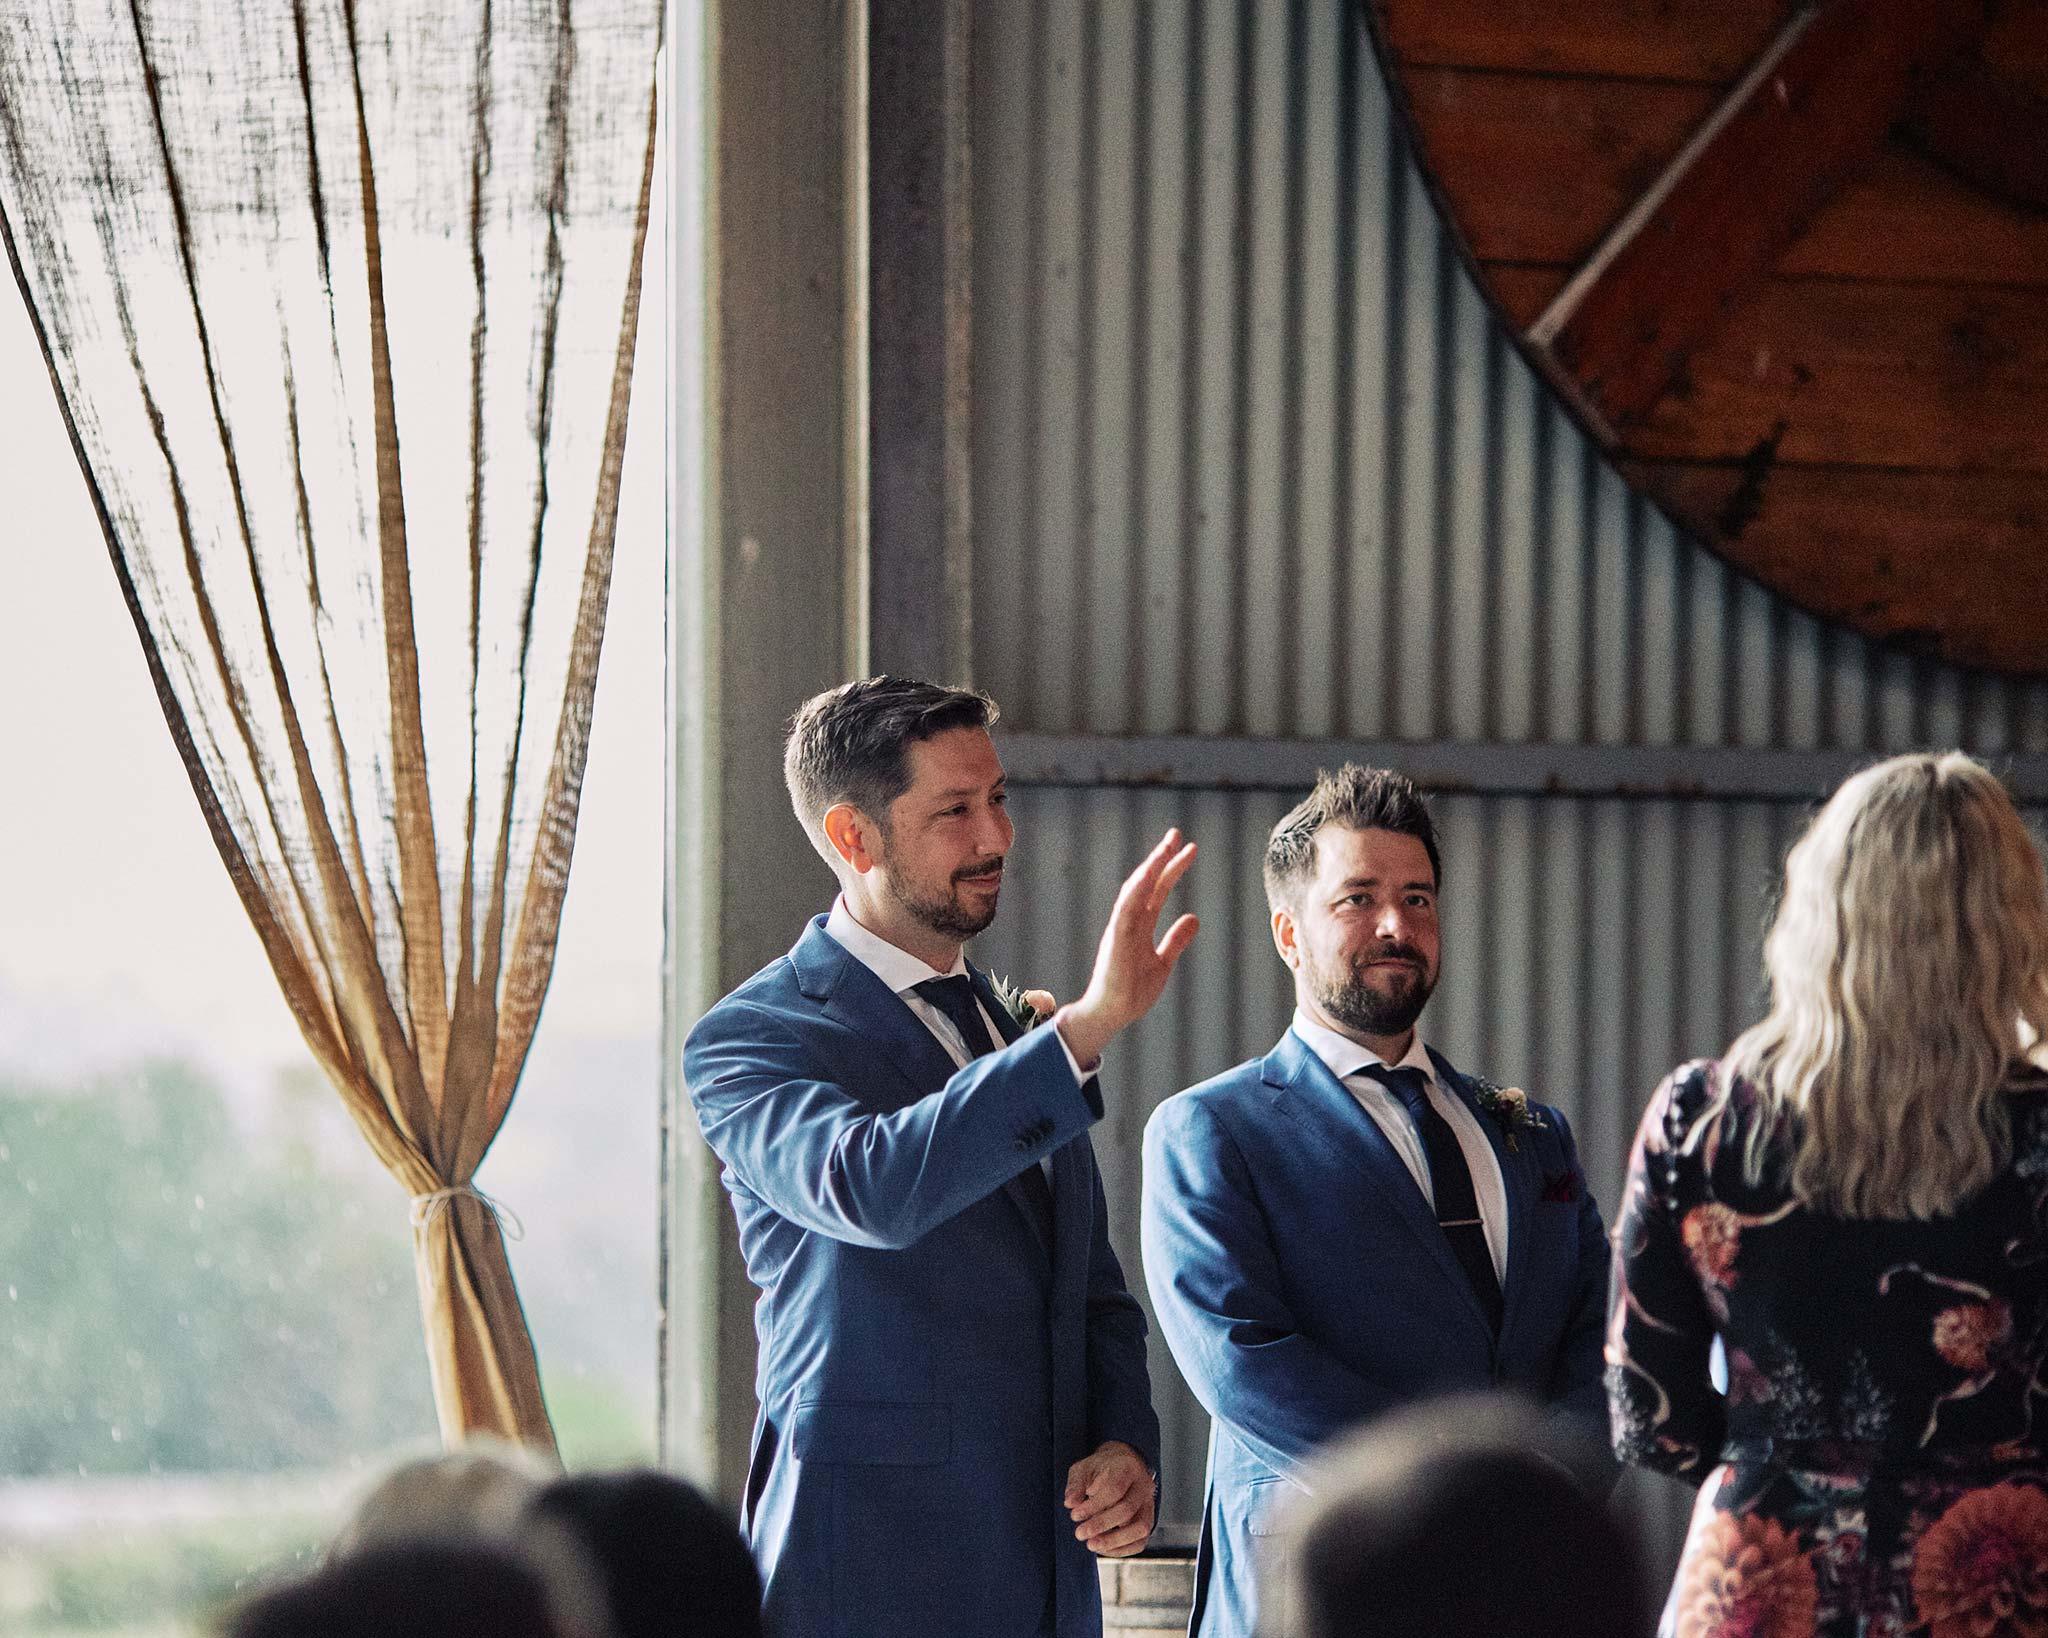 Zonzo estate wedding groom waiting